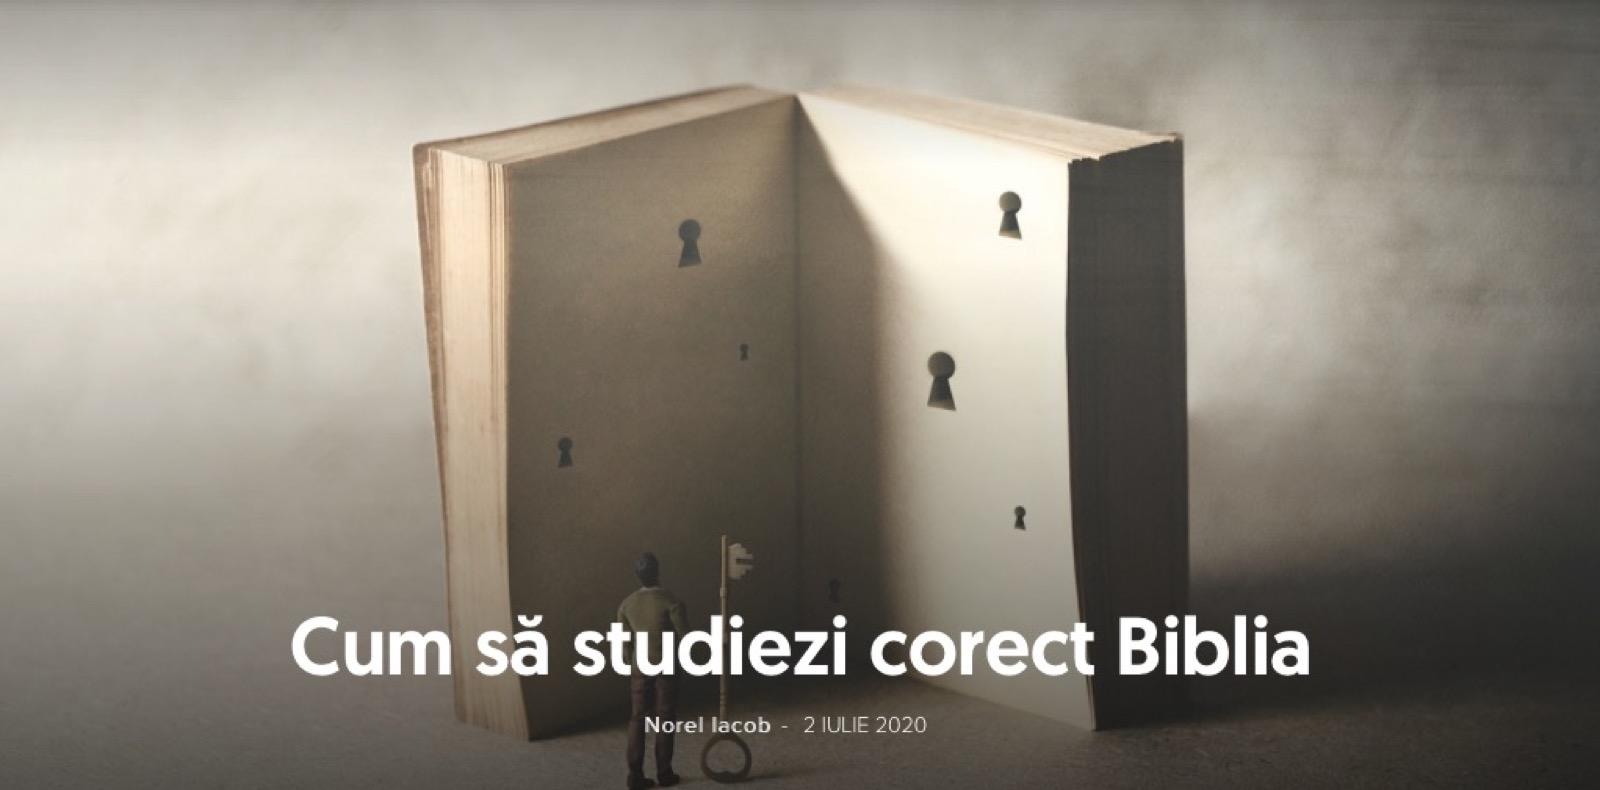 Cum sa studiem corect Biblia